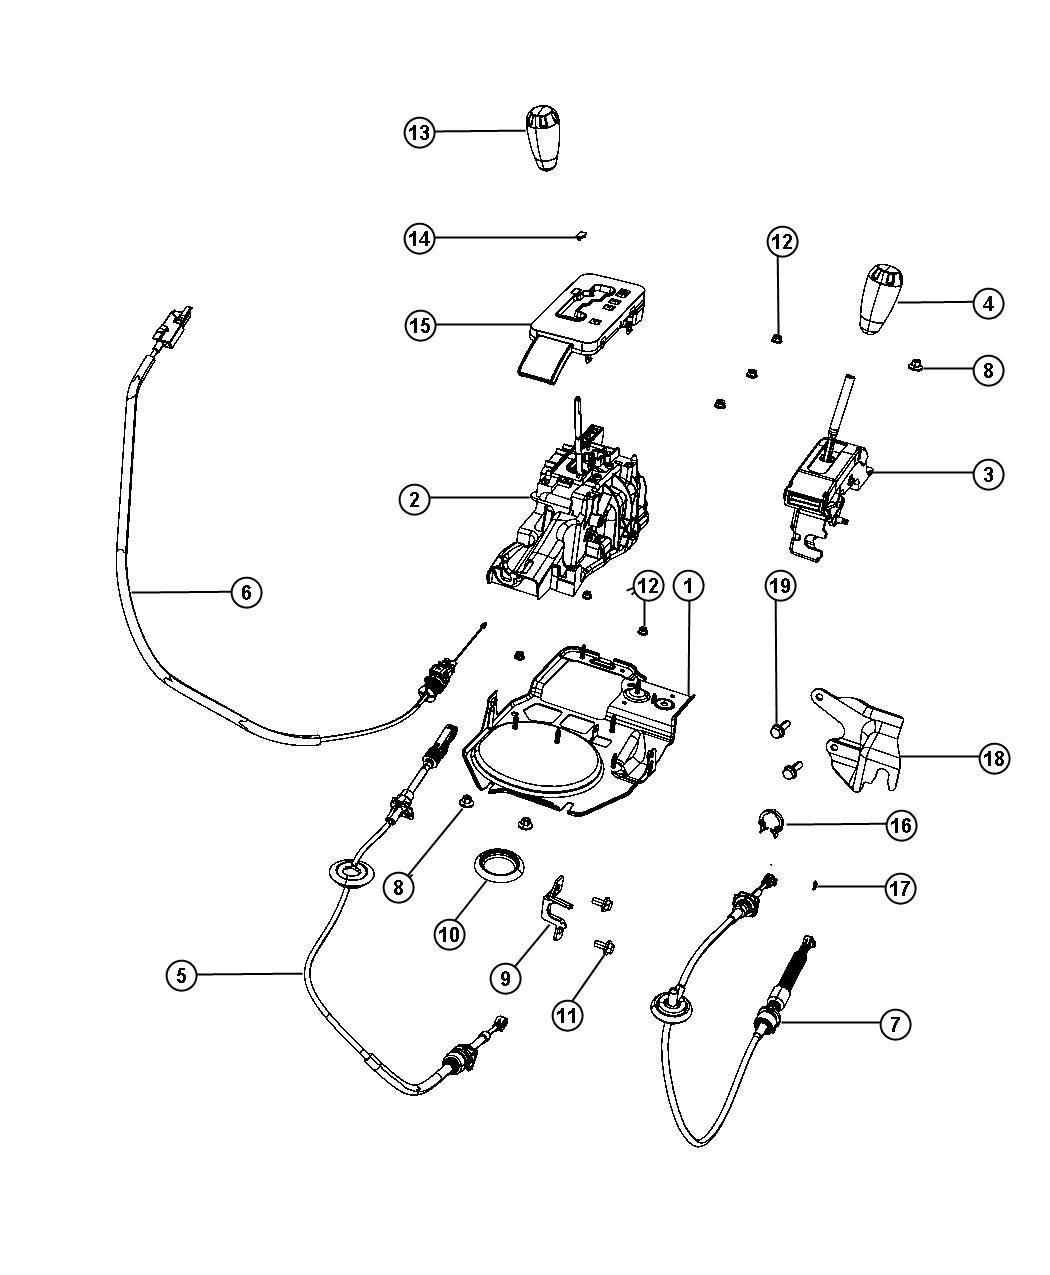 Jeep Wrangler Cable Brake Interlock Ignition Key